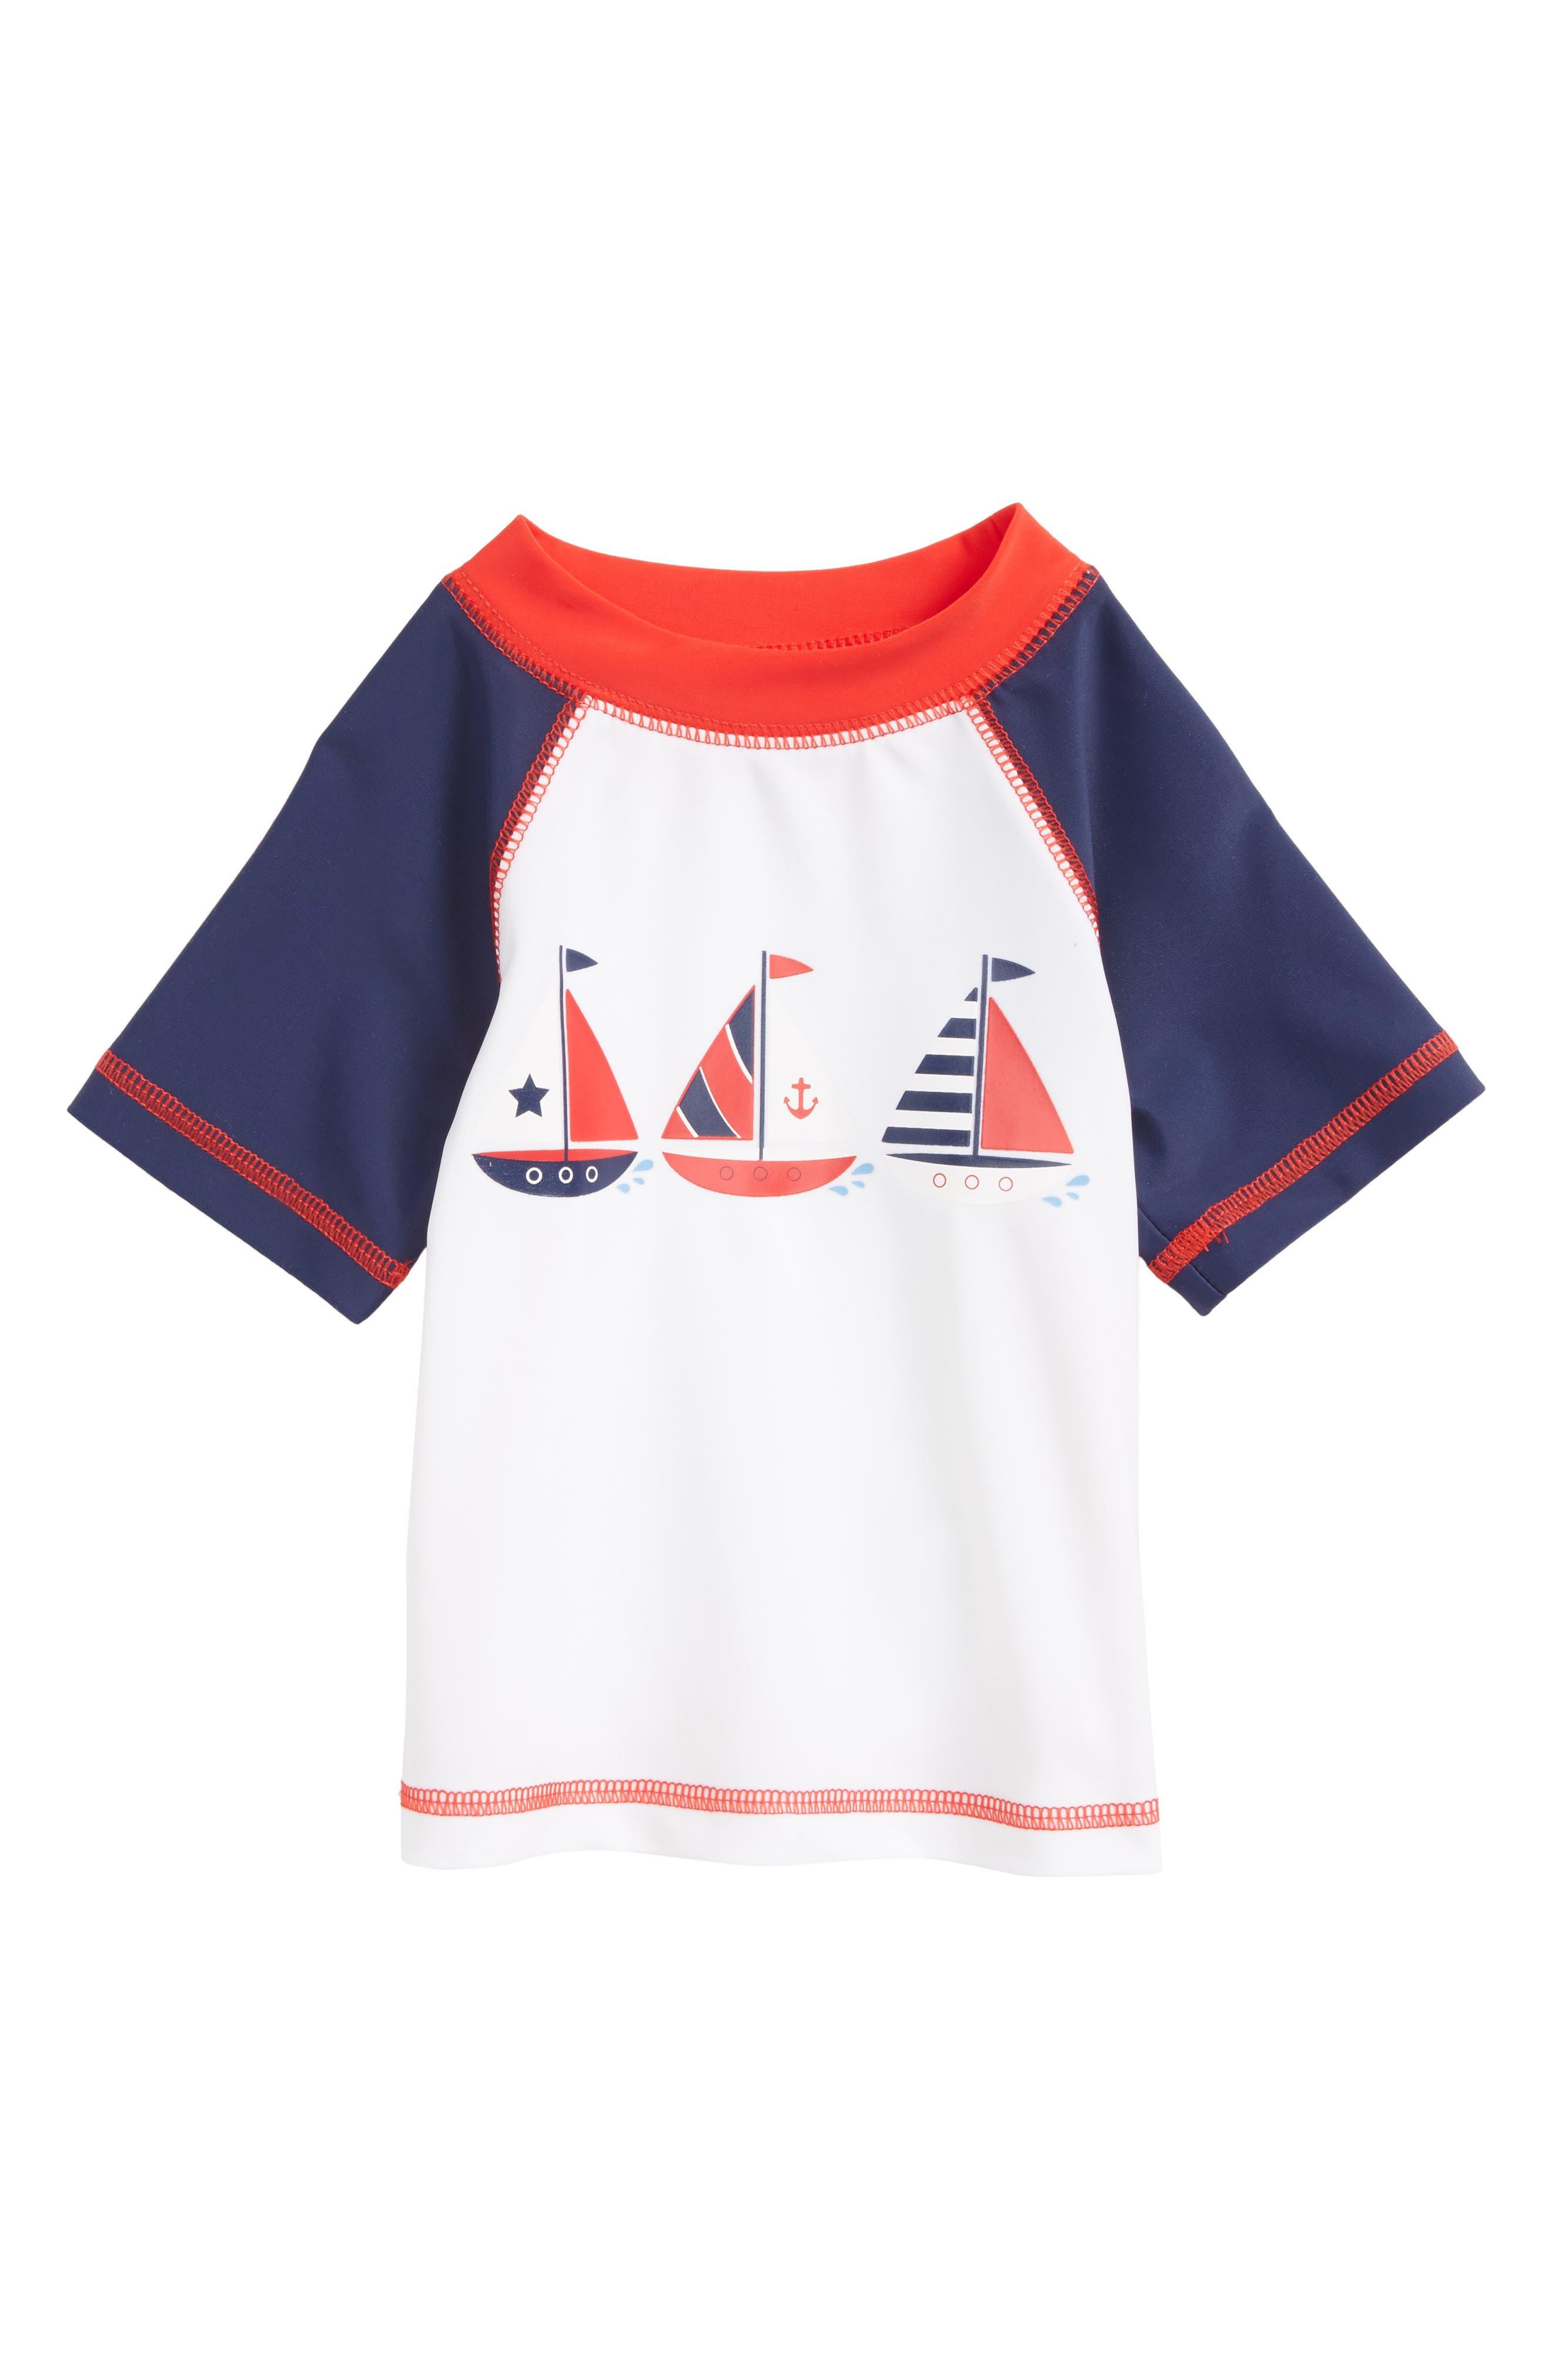 Main Image - Little Me Sailboat UPF 50+ Rashguard (Baby Boys)